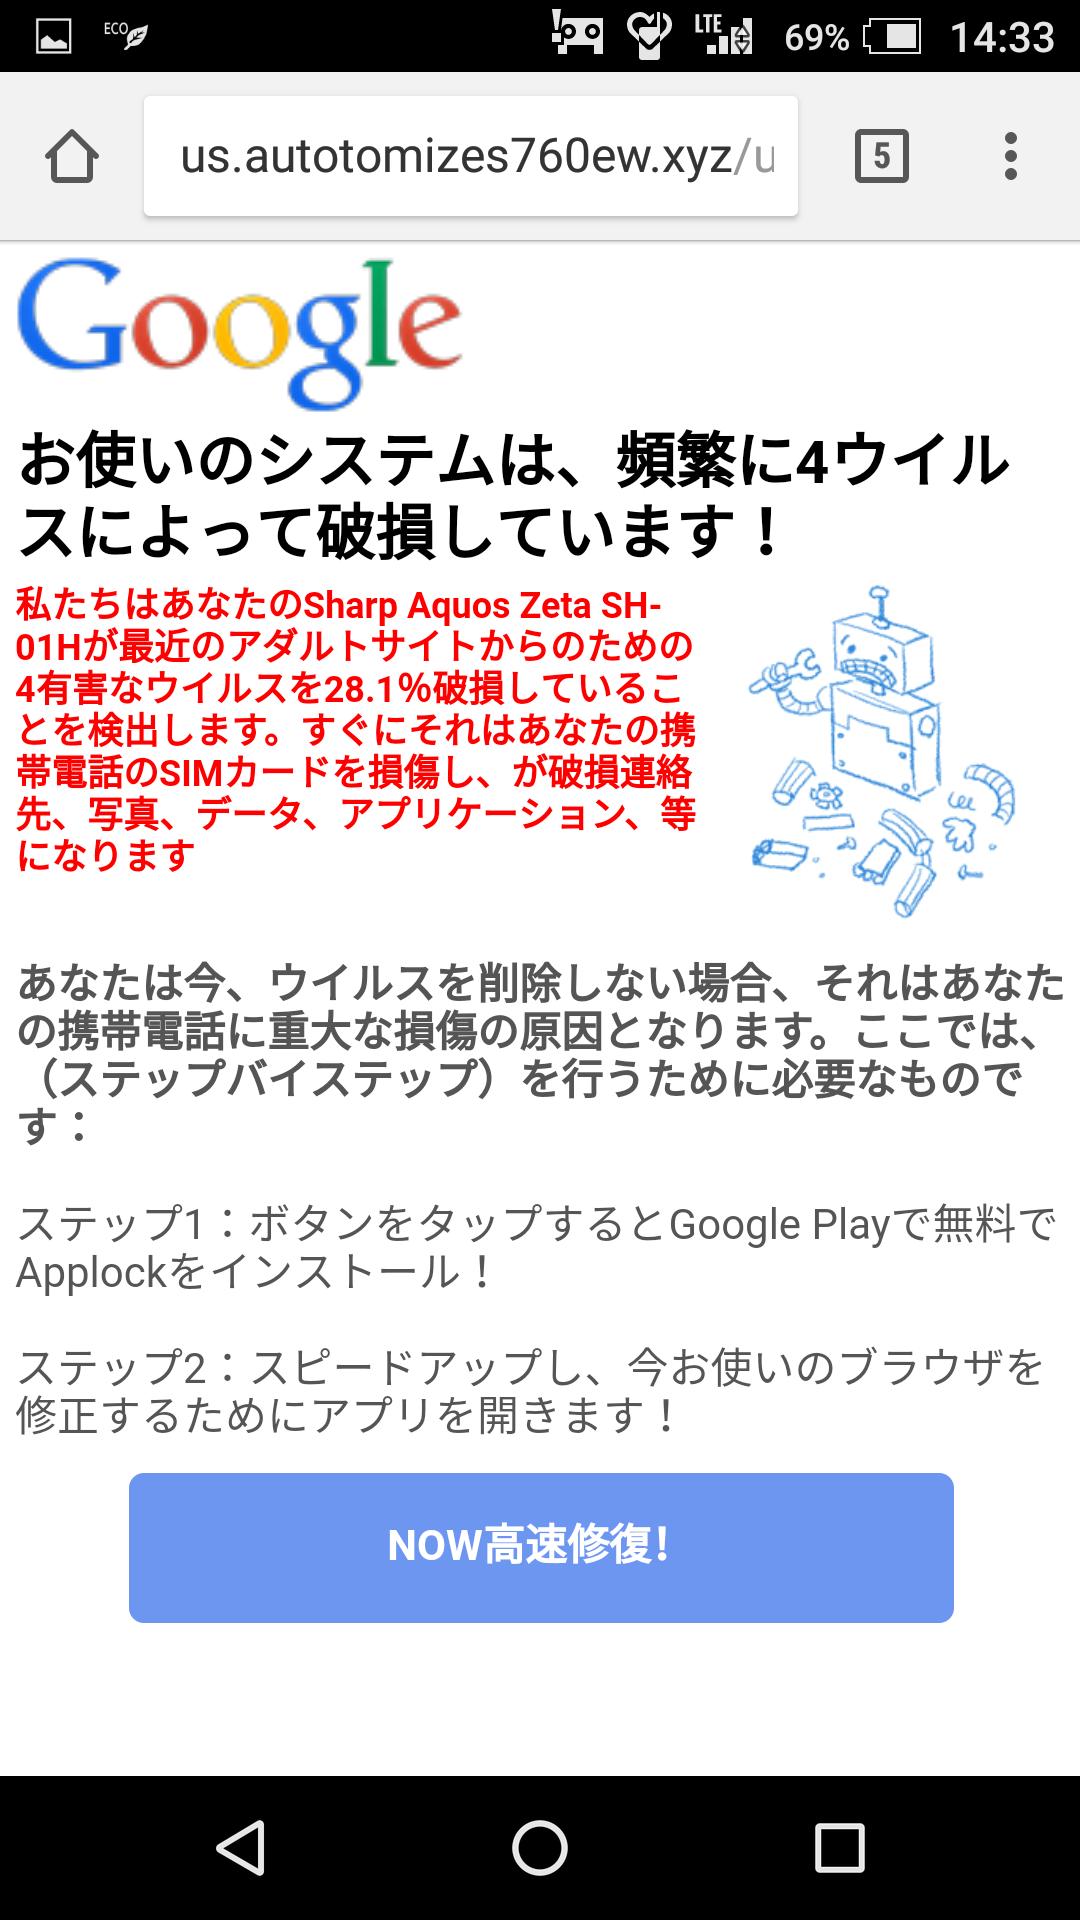 Screenshot_20171021-143341.png